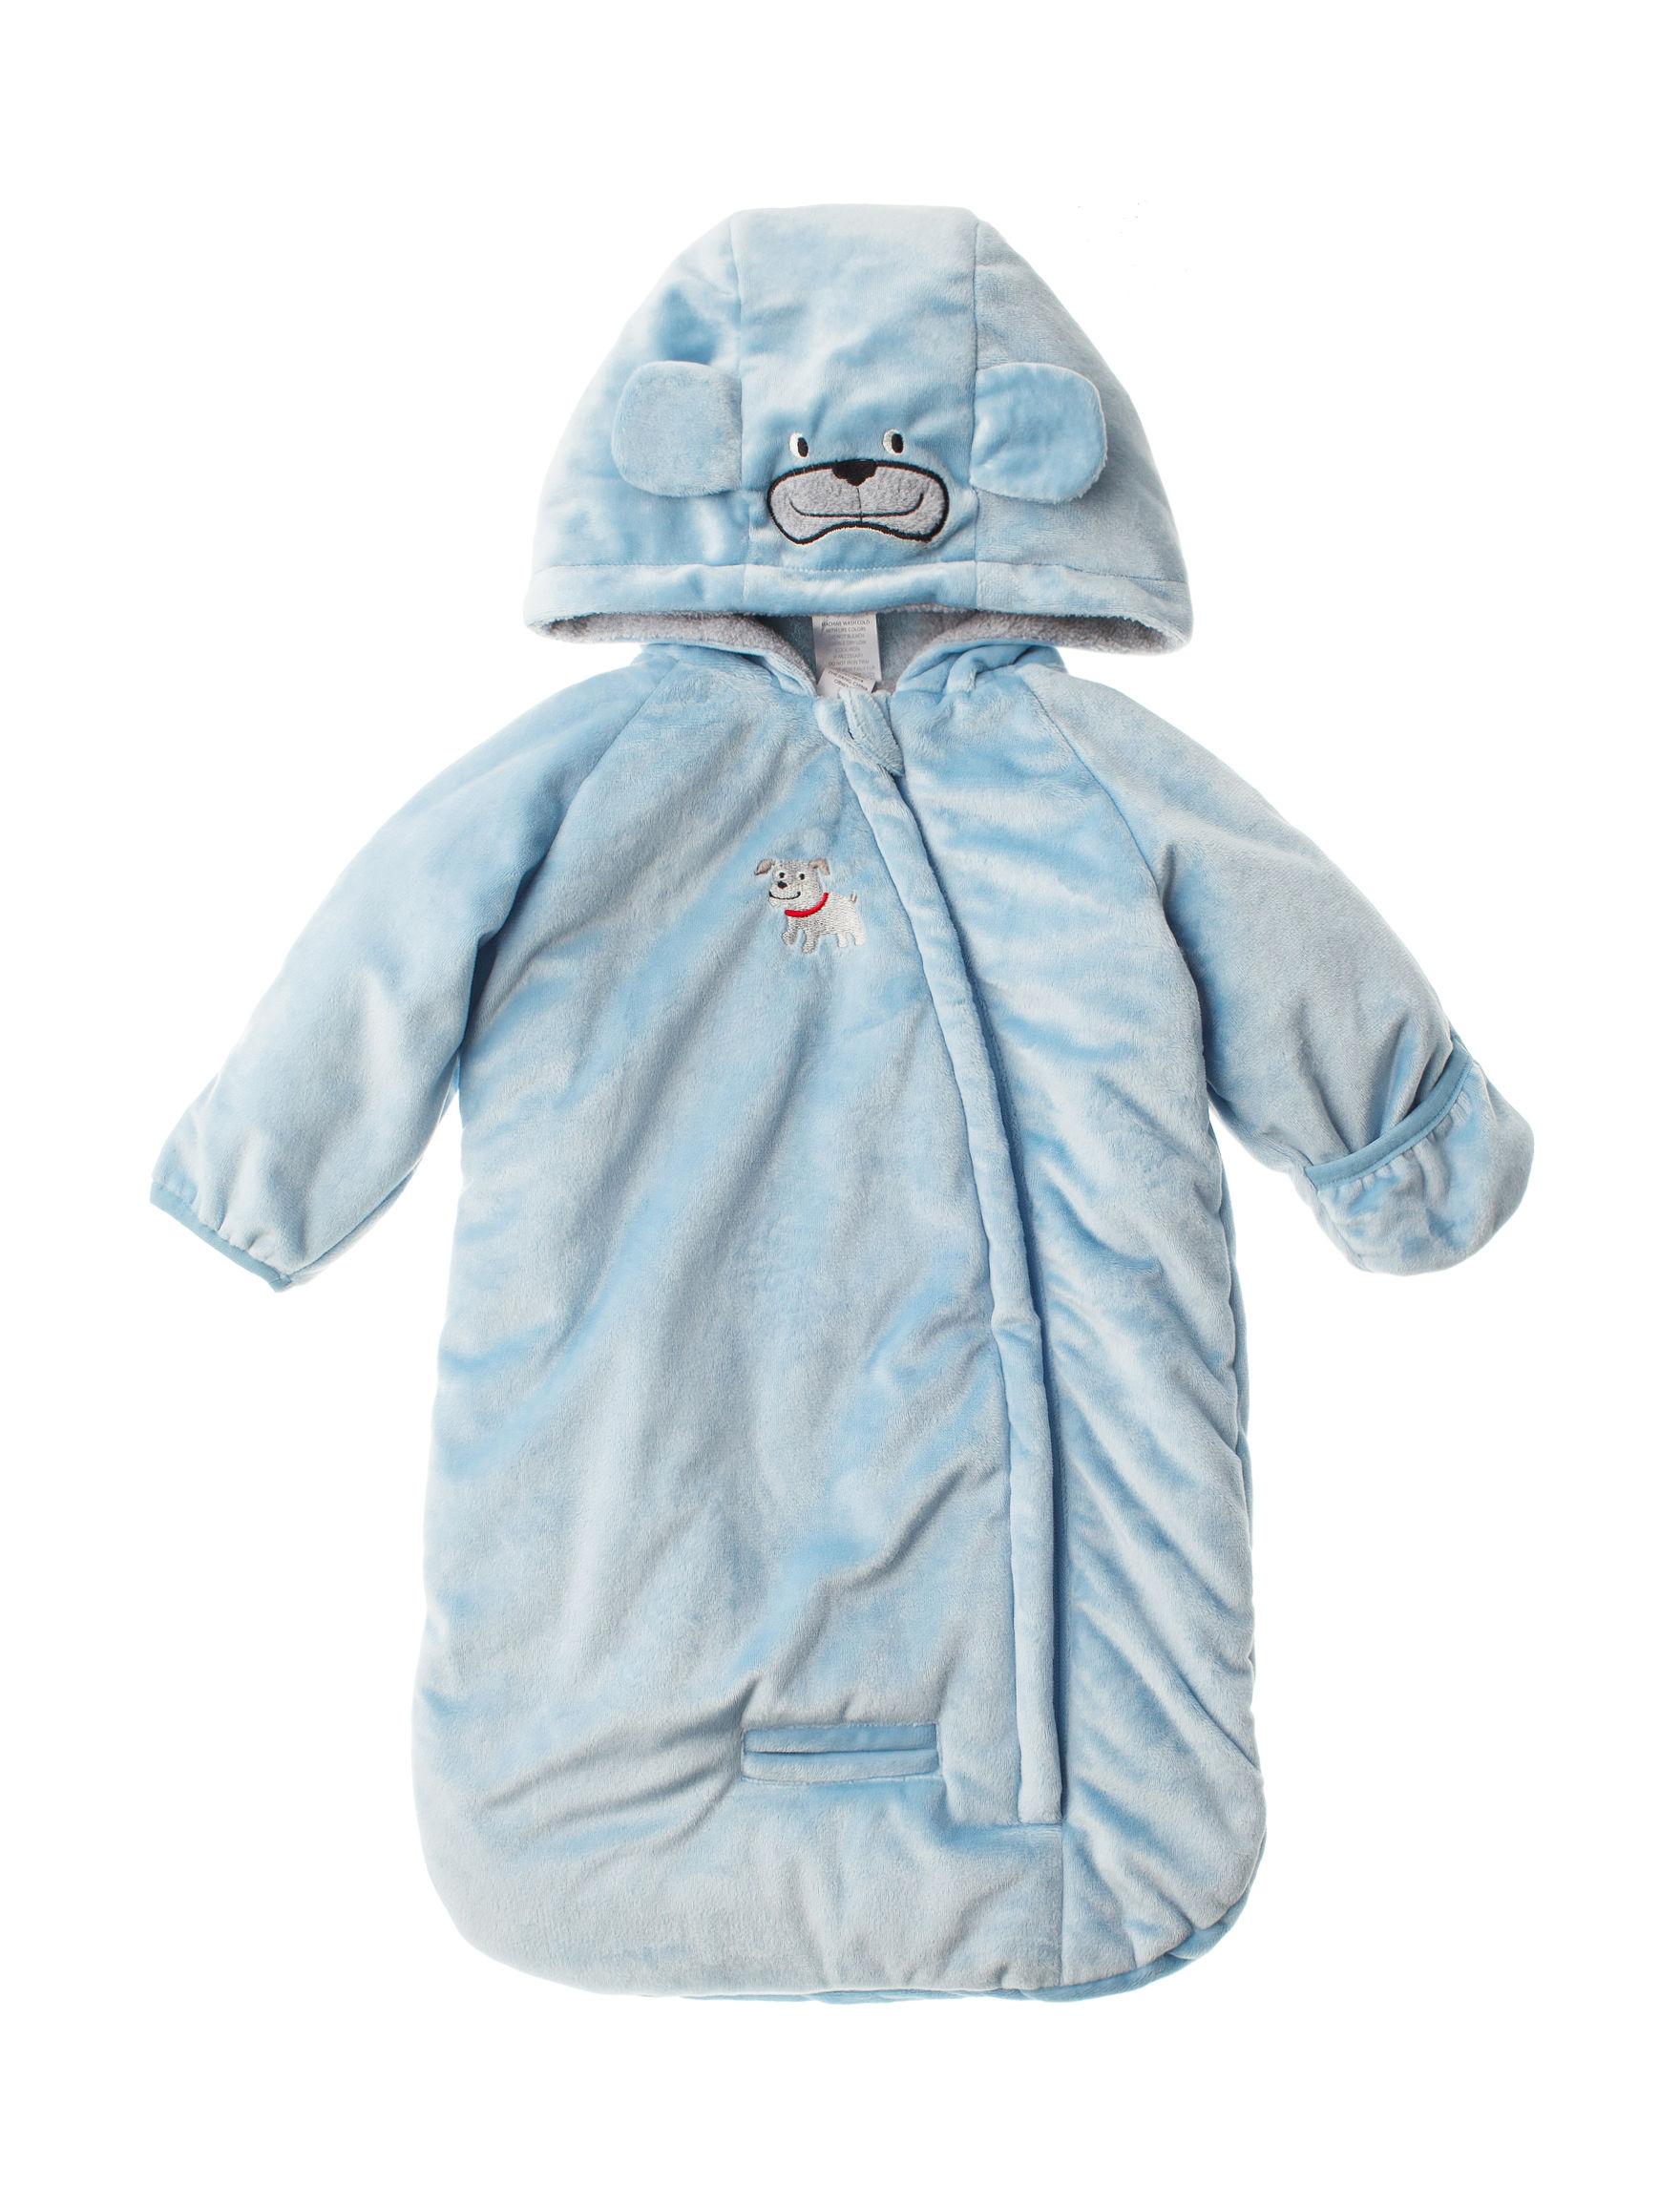 QT Baby Blue Lightweight Jackets & Blazers